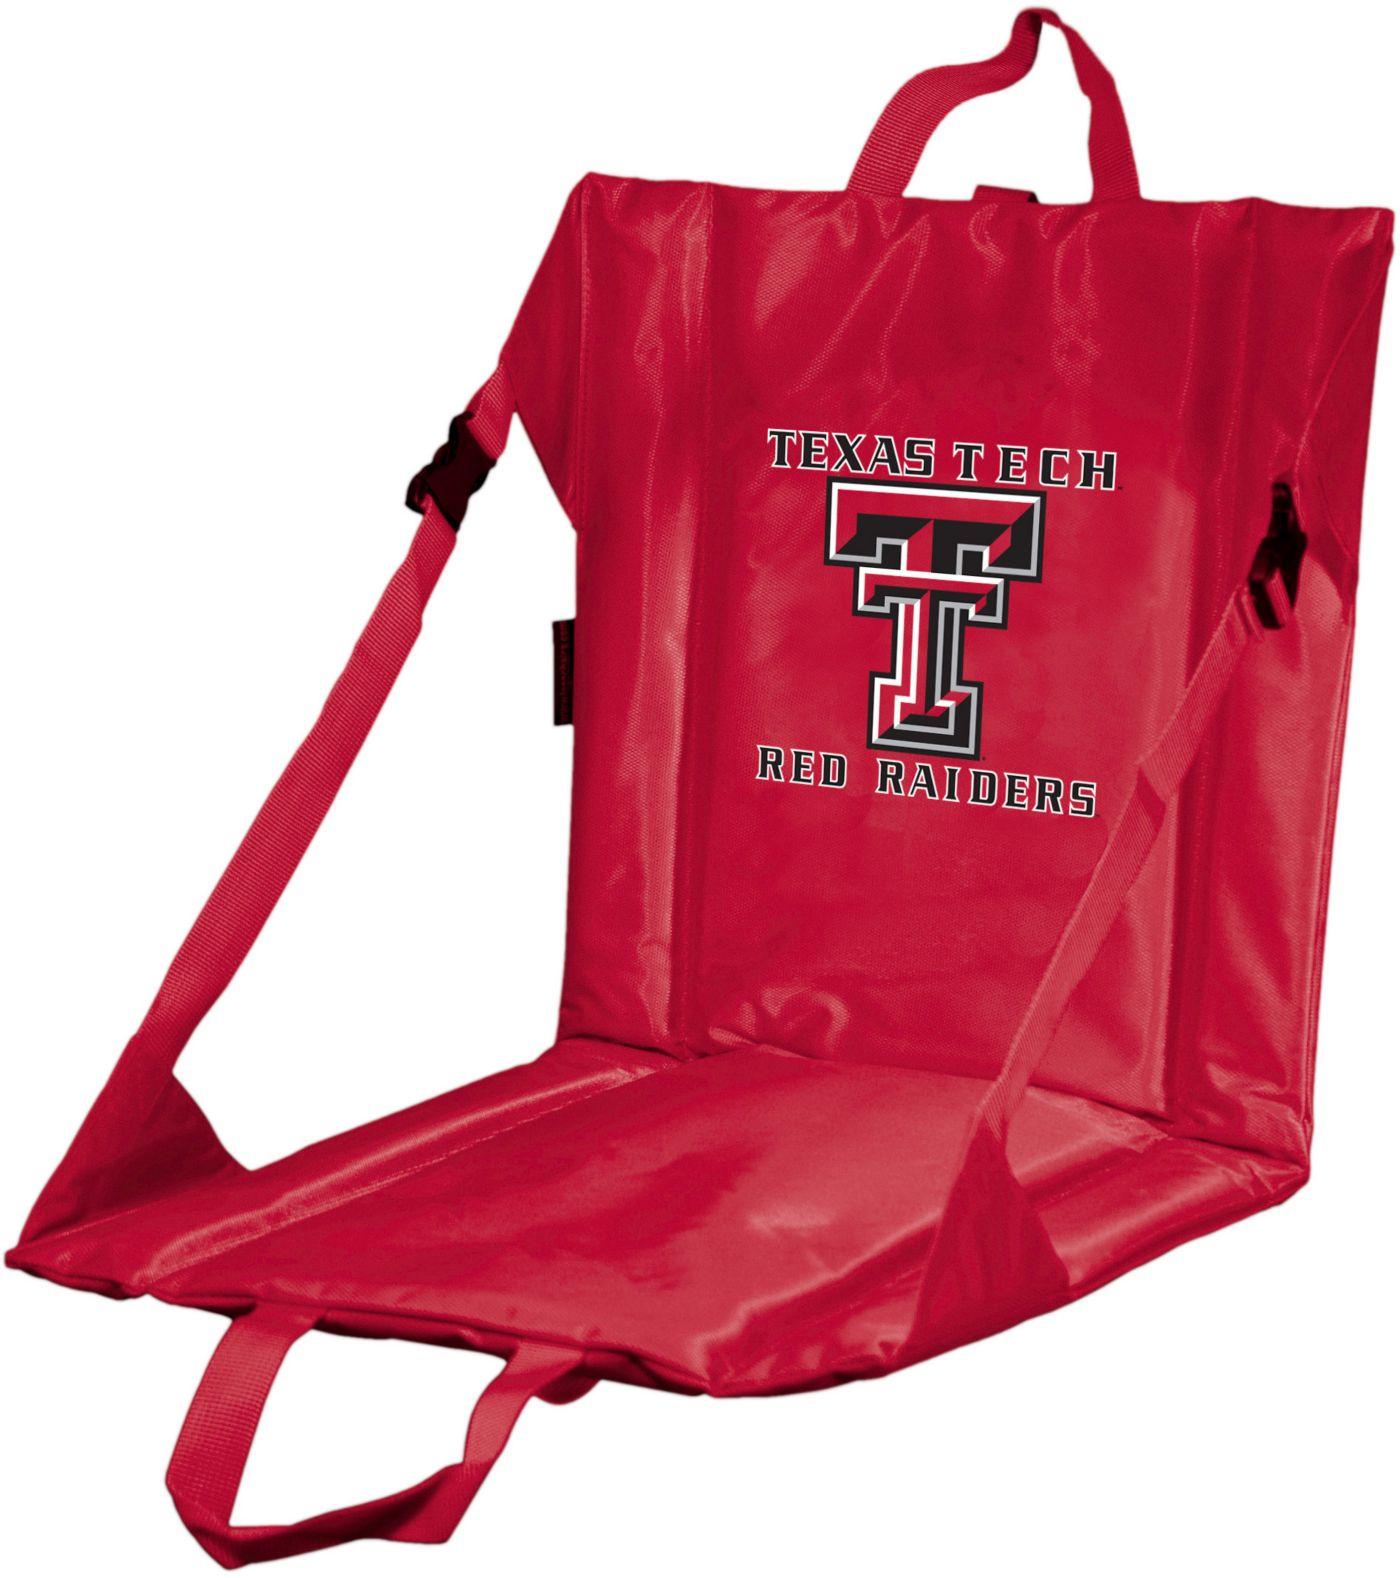 Texas Tech Red Raiders Stadium Seat